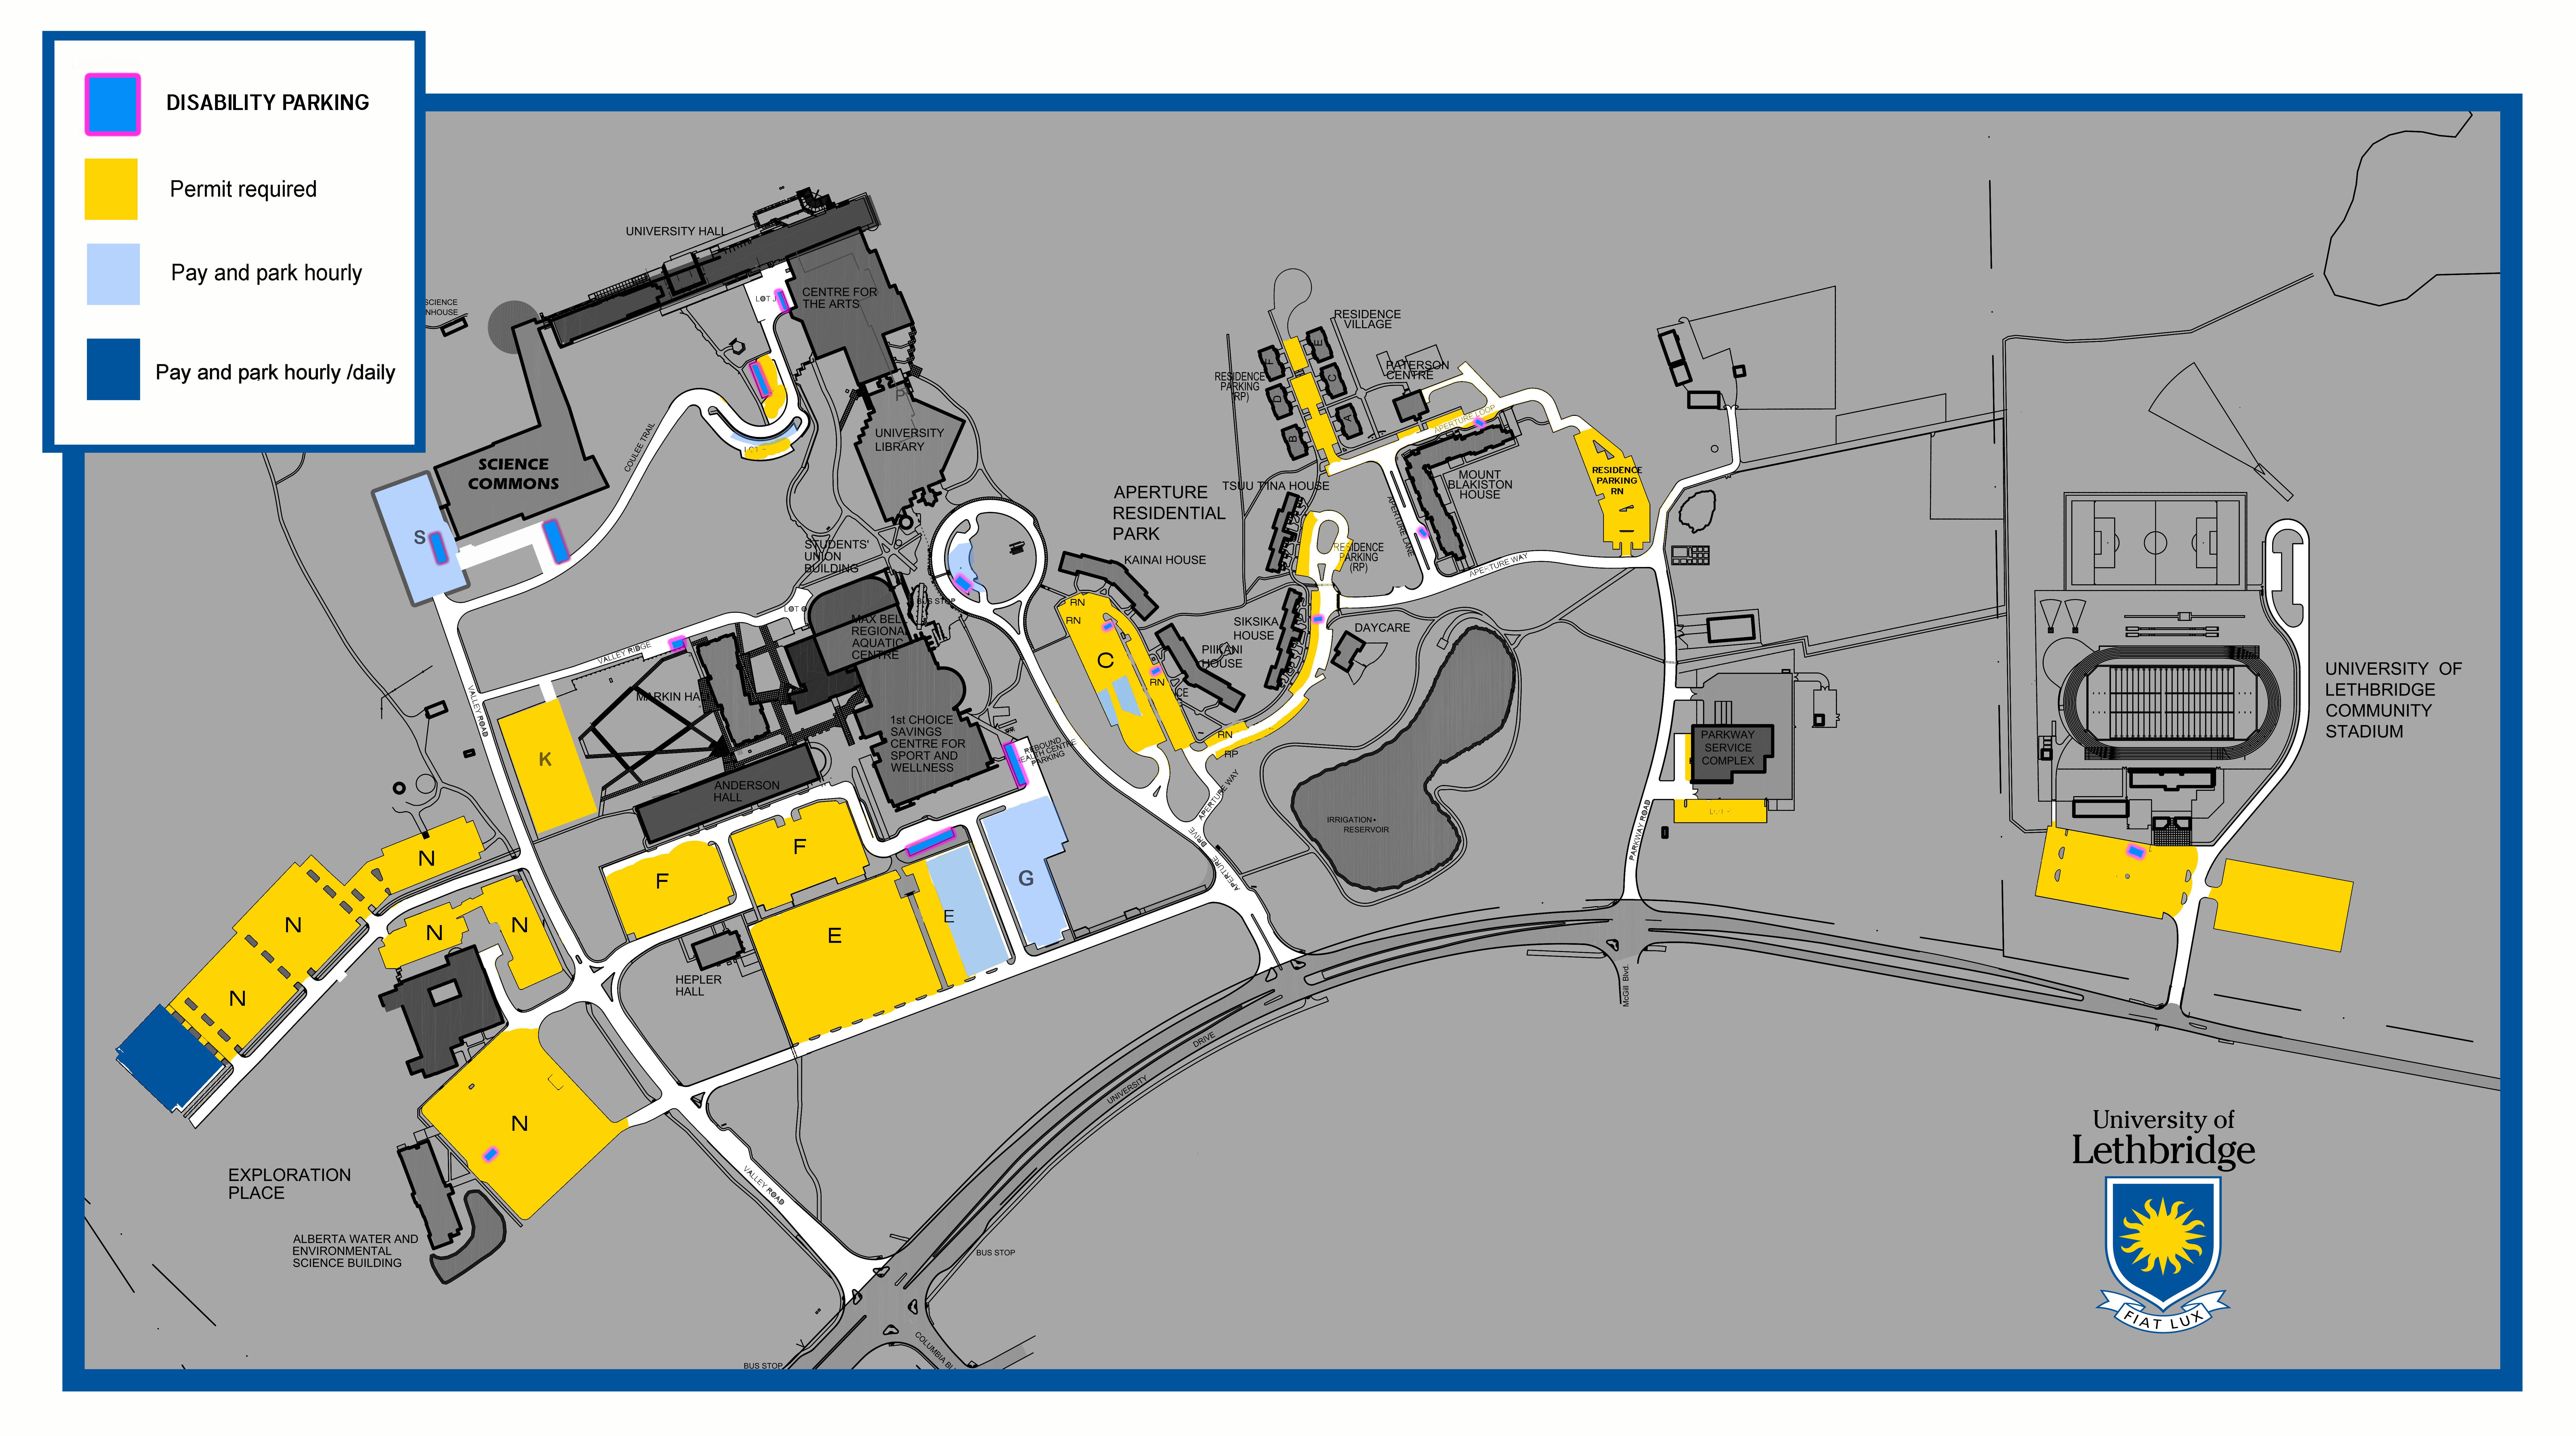 u of winnipeg campus map, university of calgary parking map, u of waterloo campus map, u of lethbridge campus map, u of memphis campus map, u of regina campus map, calgary alberta map, park map, u of c campus map, on u of calgary campus map